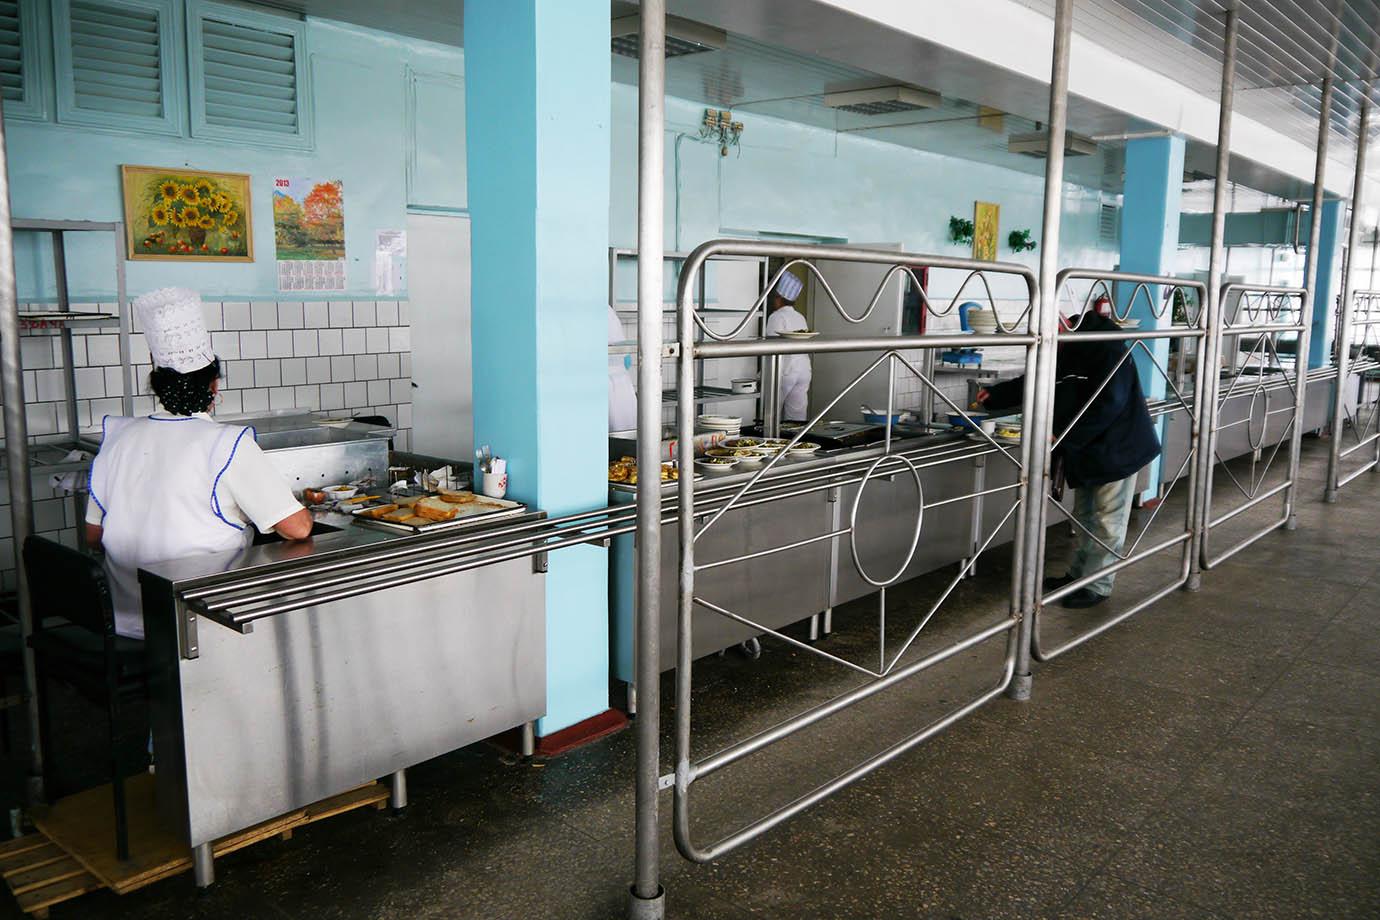 chernobyl-cafeteria14